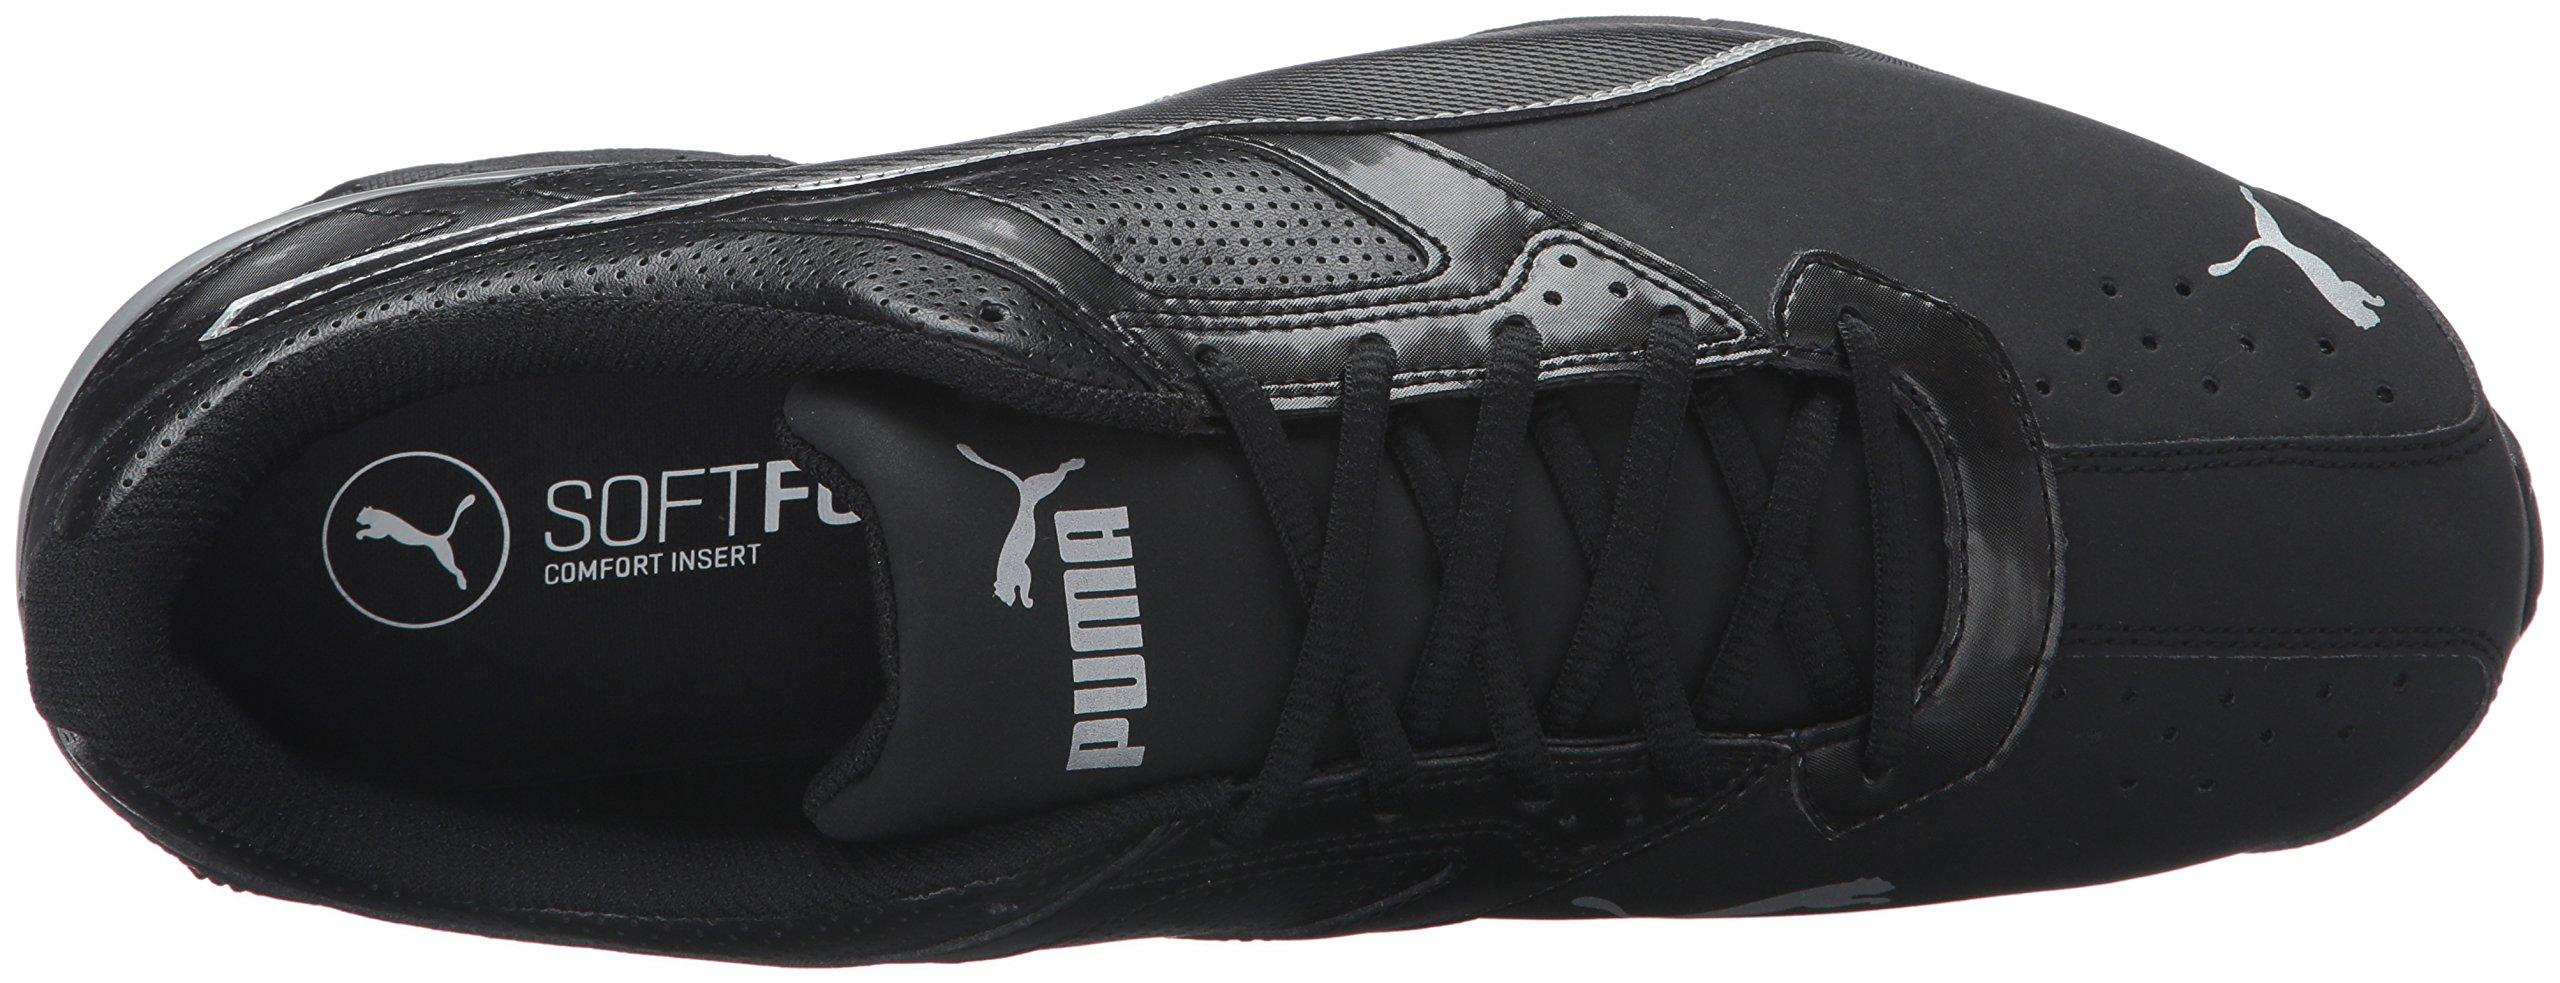 PUMA Men's Tazon 6 FM Puma Black/ Puma Silver Running Shoe - 8 D(M) US by PUMA (Image #8)